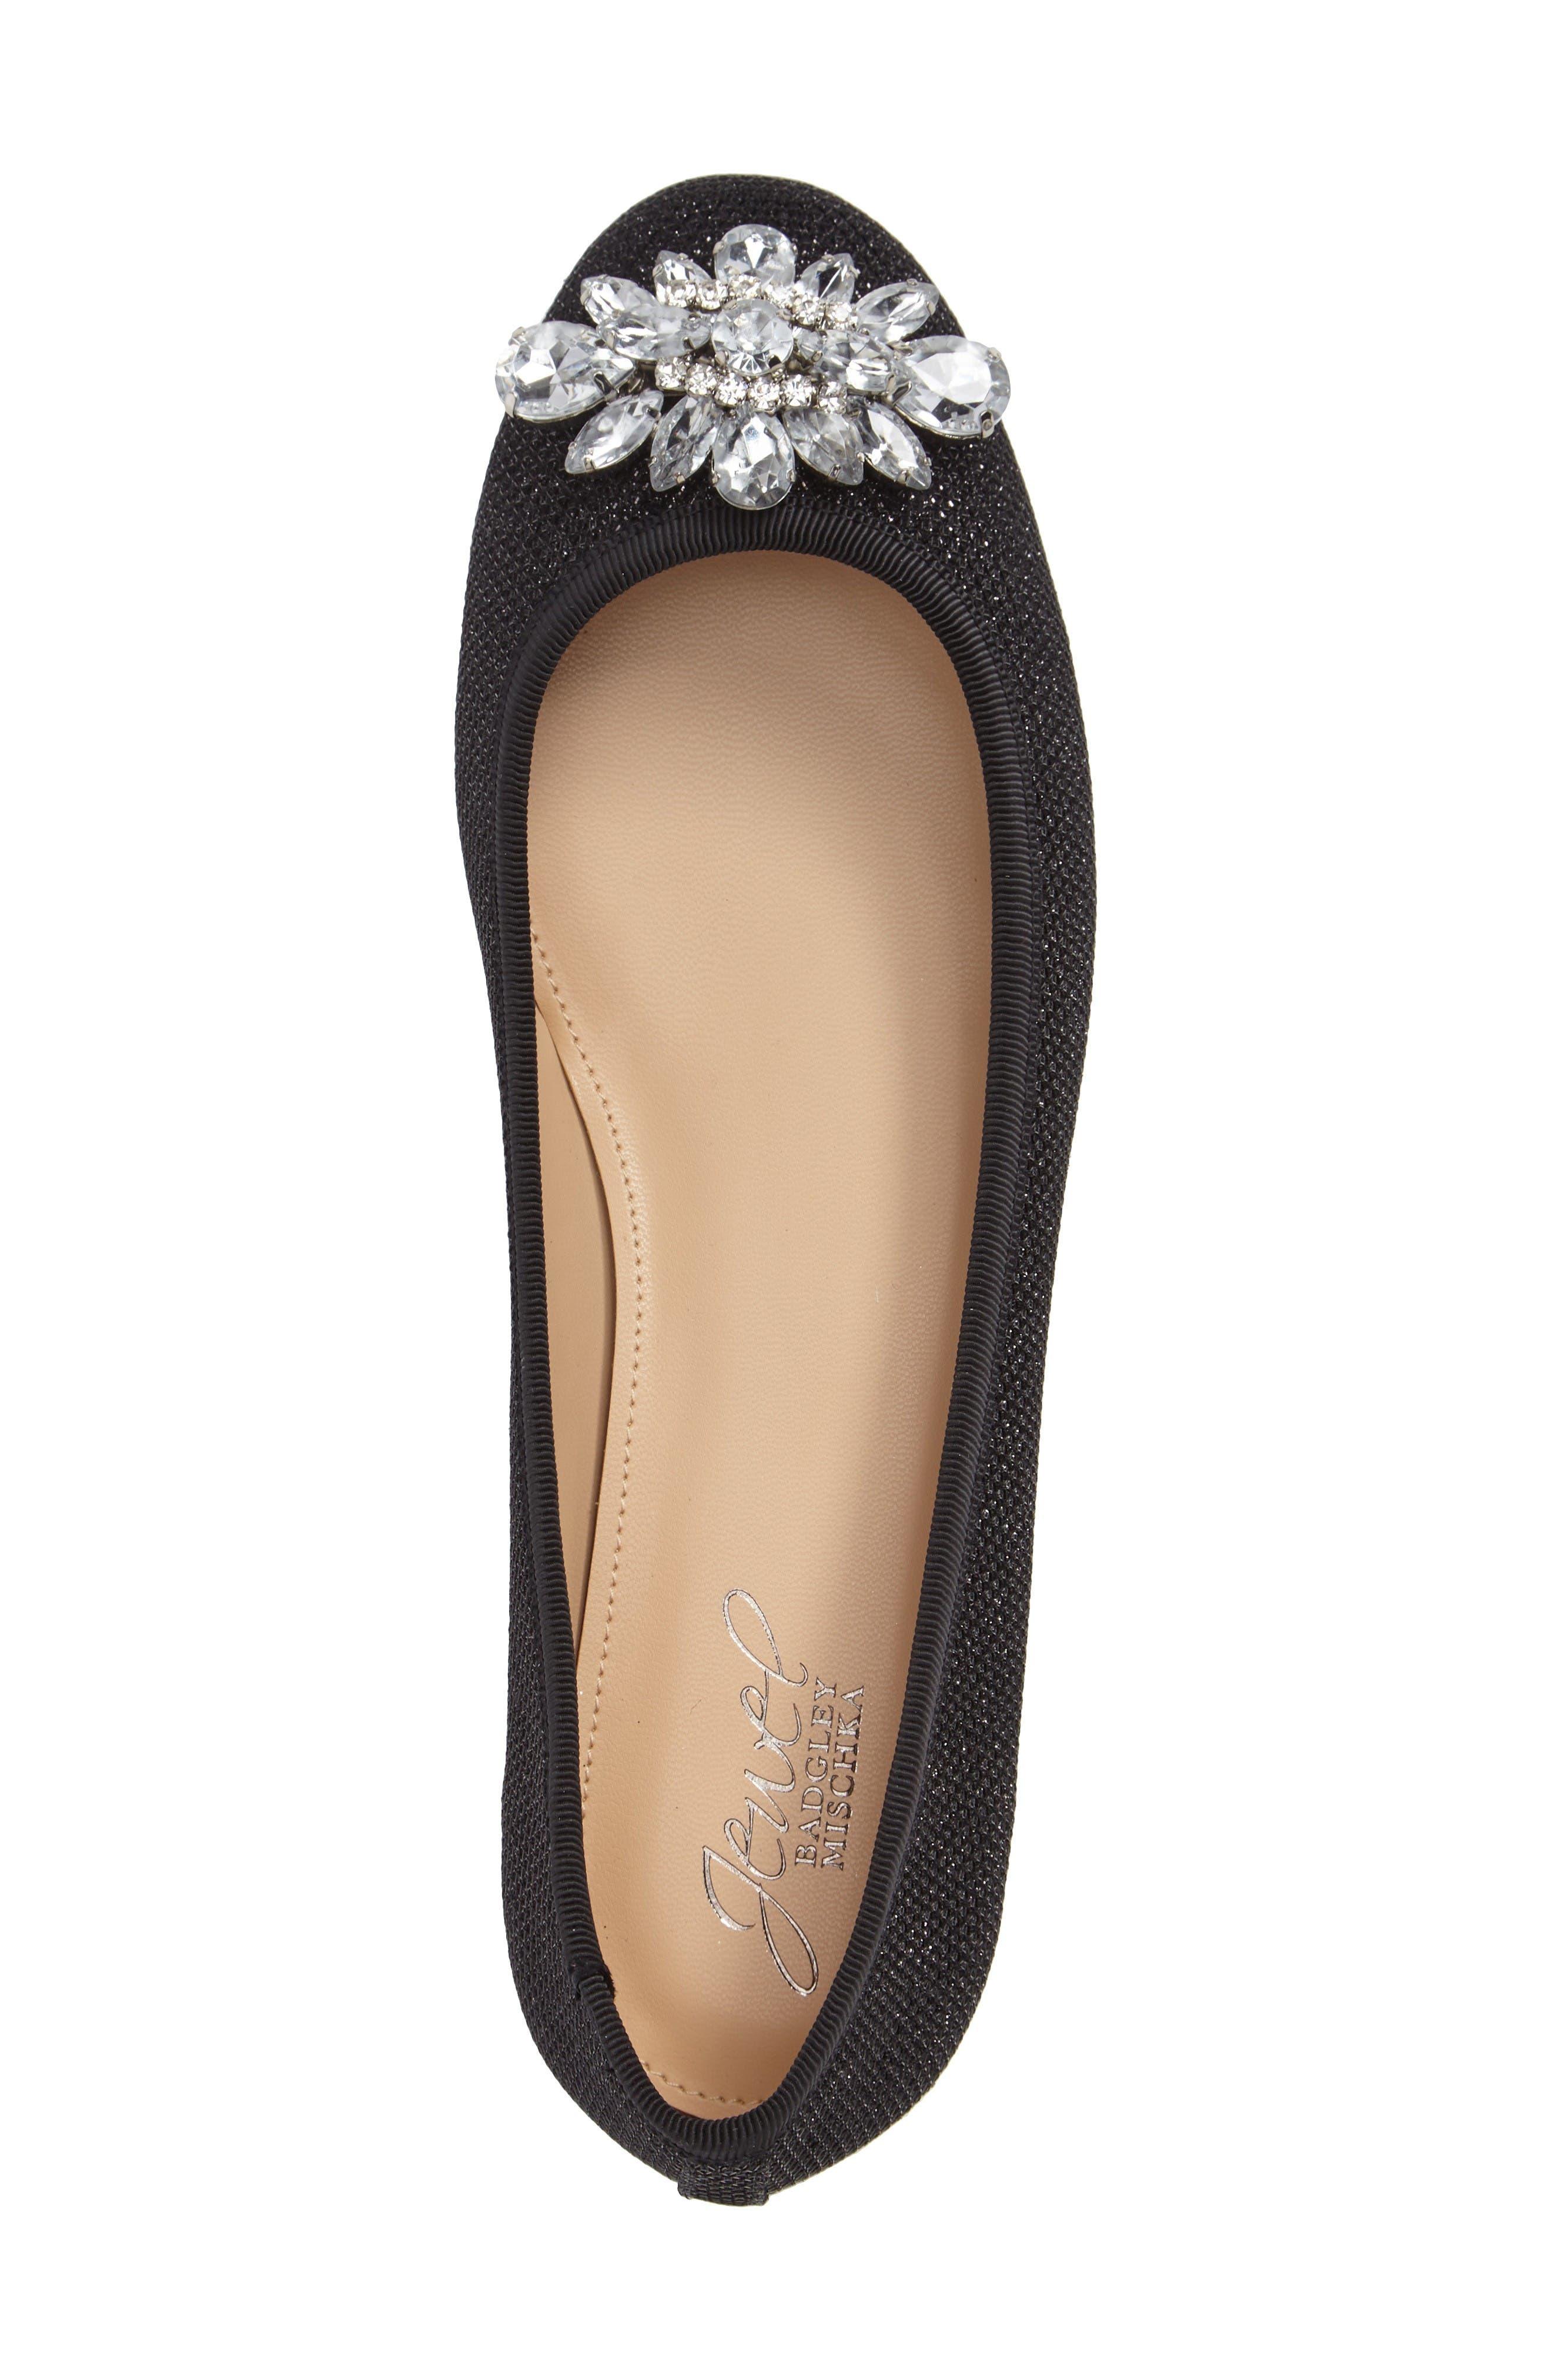 Cabella Embellished Ballet Flat,                             Alternate thumbnail 3, color,                             Black Fabric